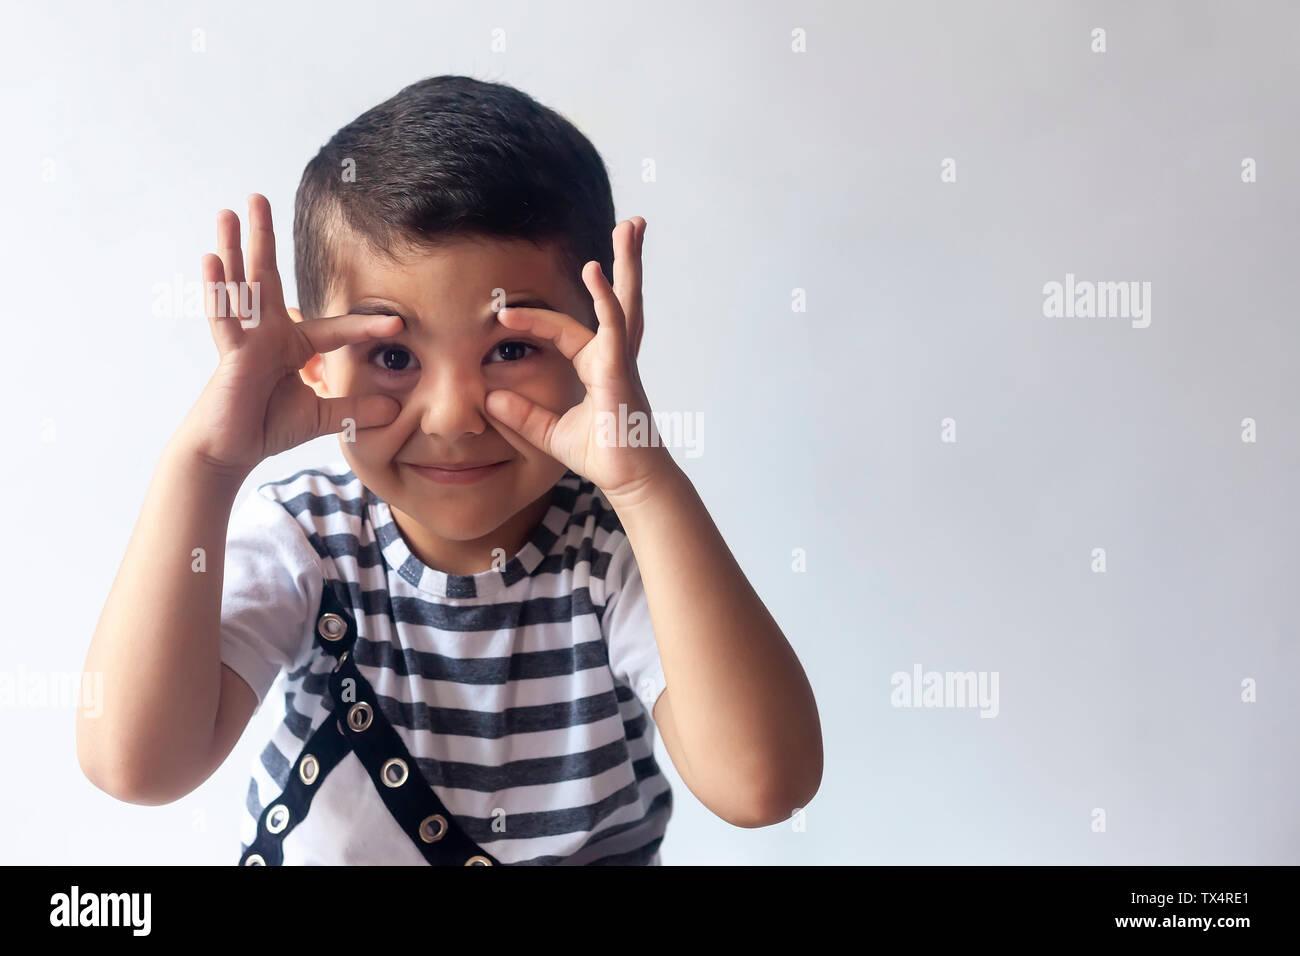 Six years boy portrait. Innocent smiling little boy on grey background. Little kid having fun. People, childhood lifestyle concept. Stock Photo